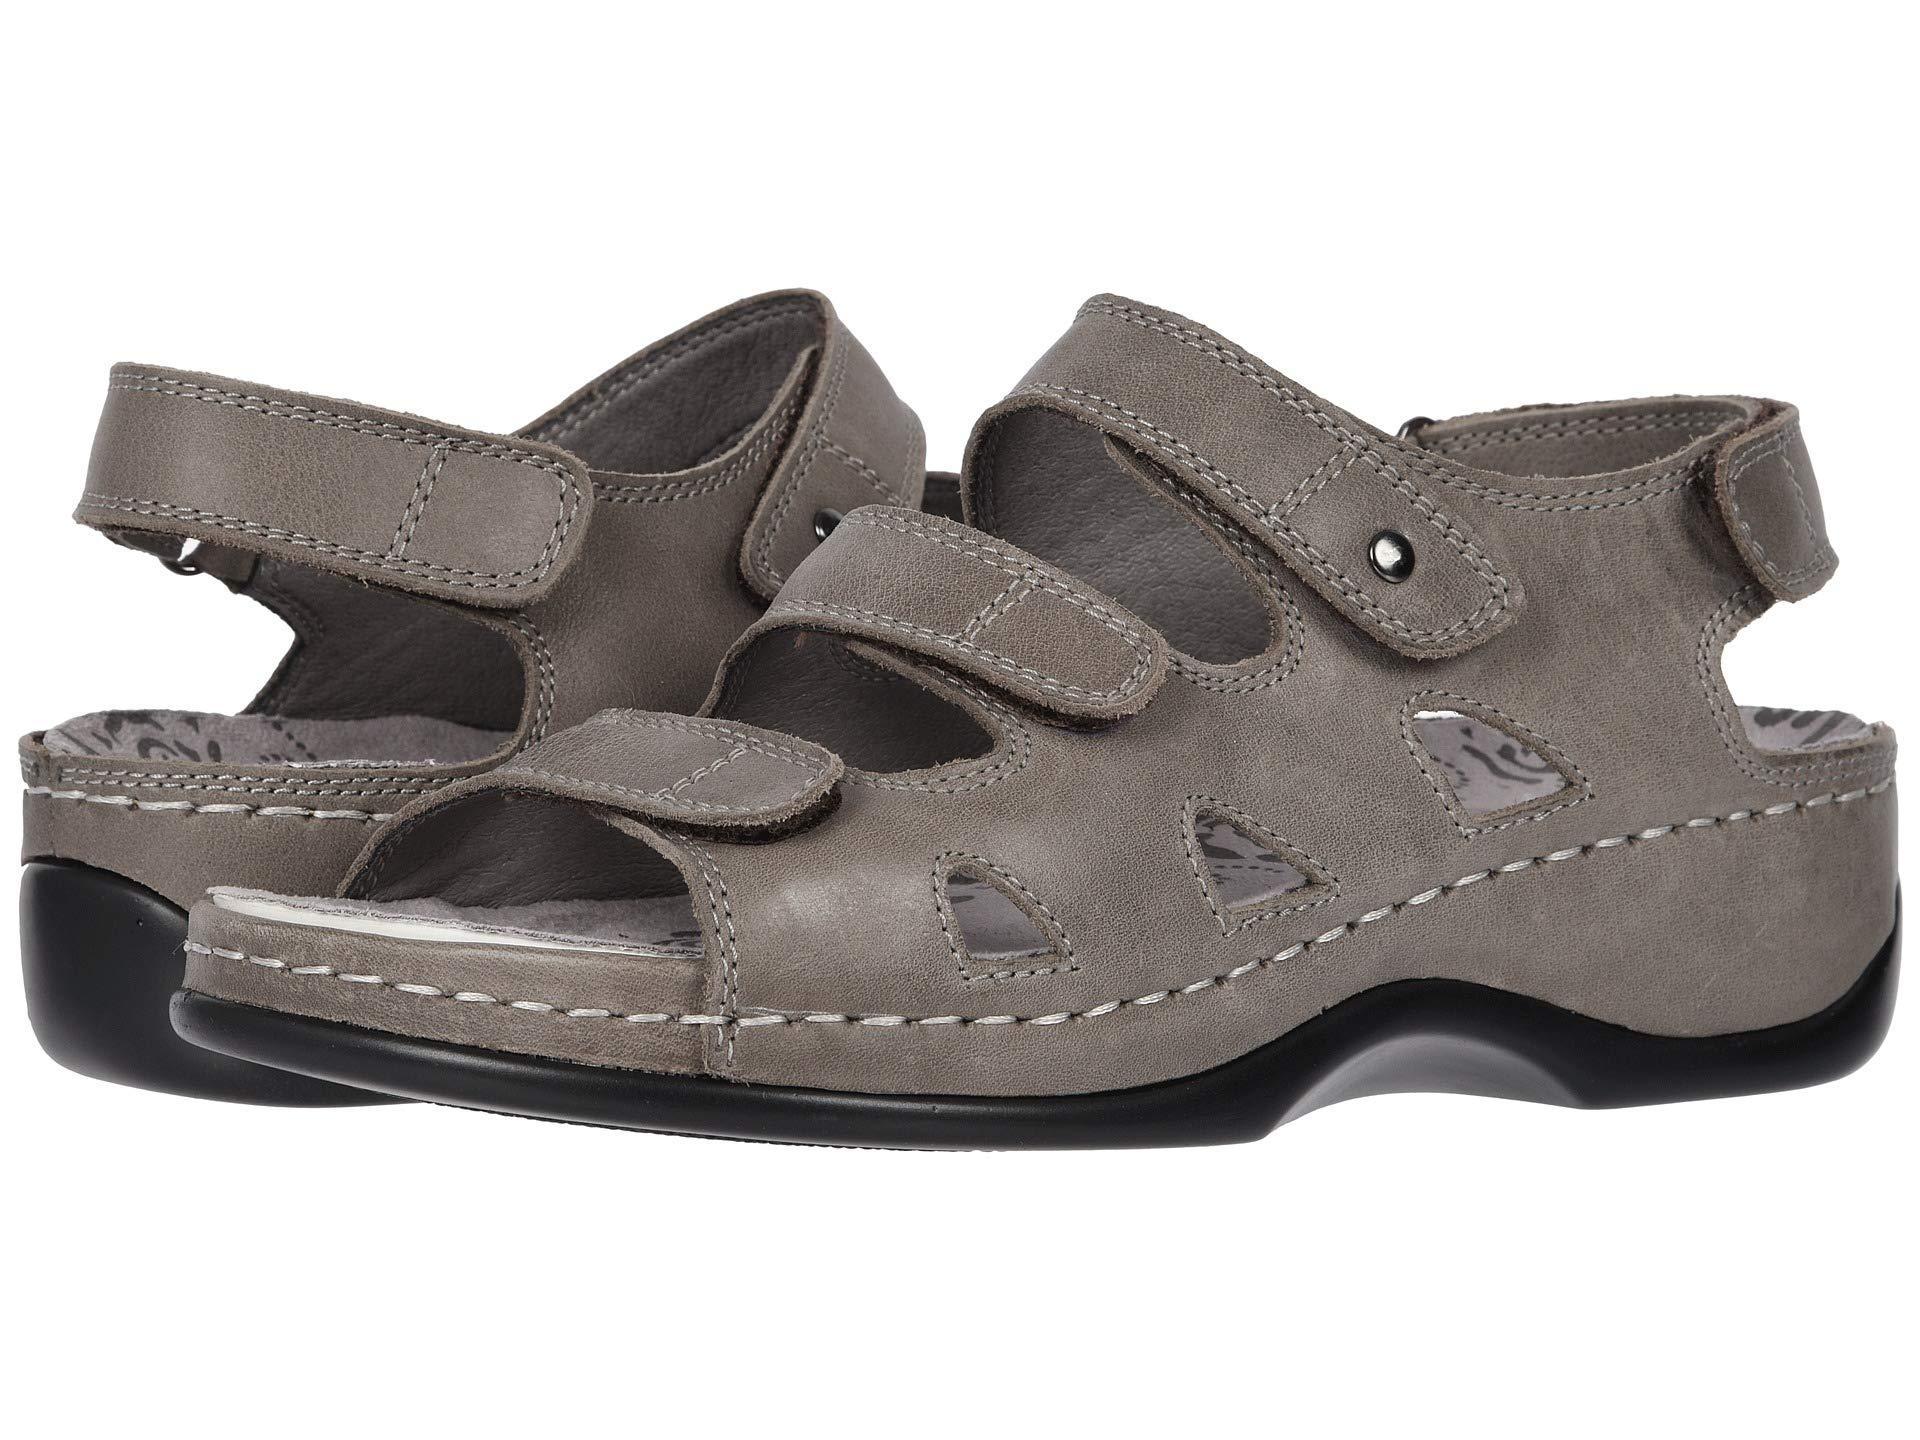 faf4a181cfd Lyst - Propet Kara (grey) Women's Sandals in Gray